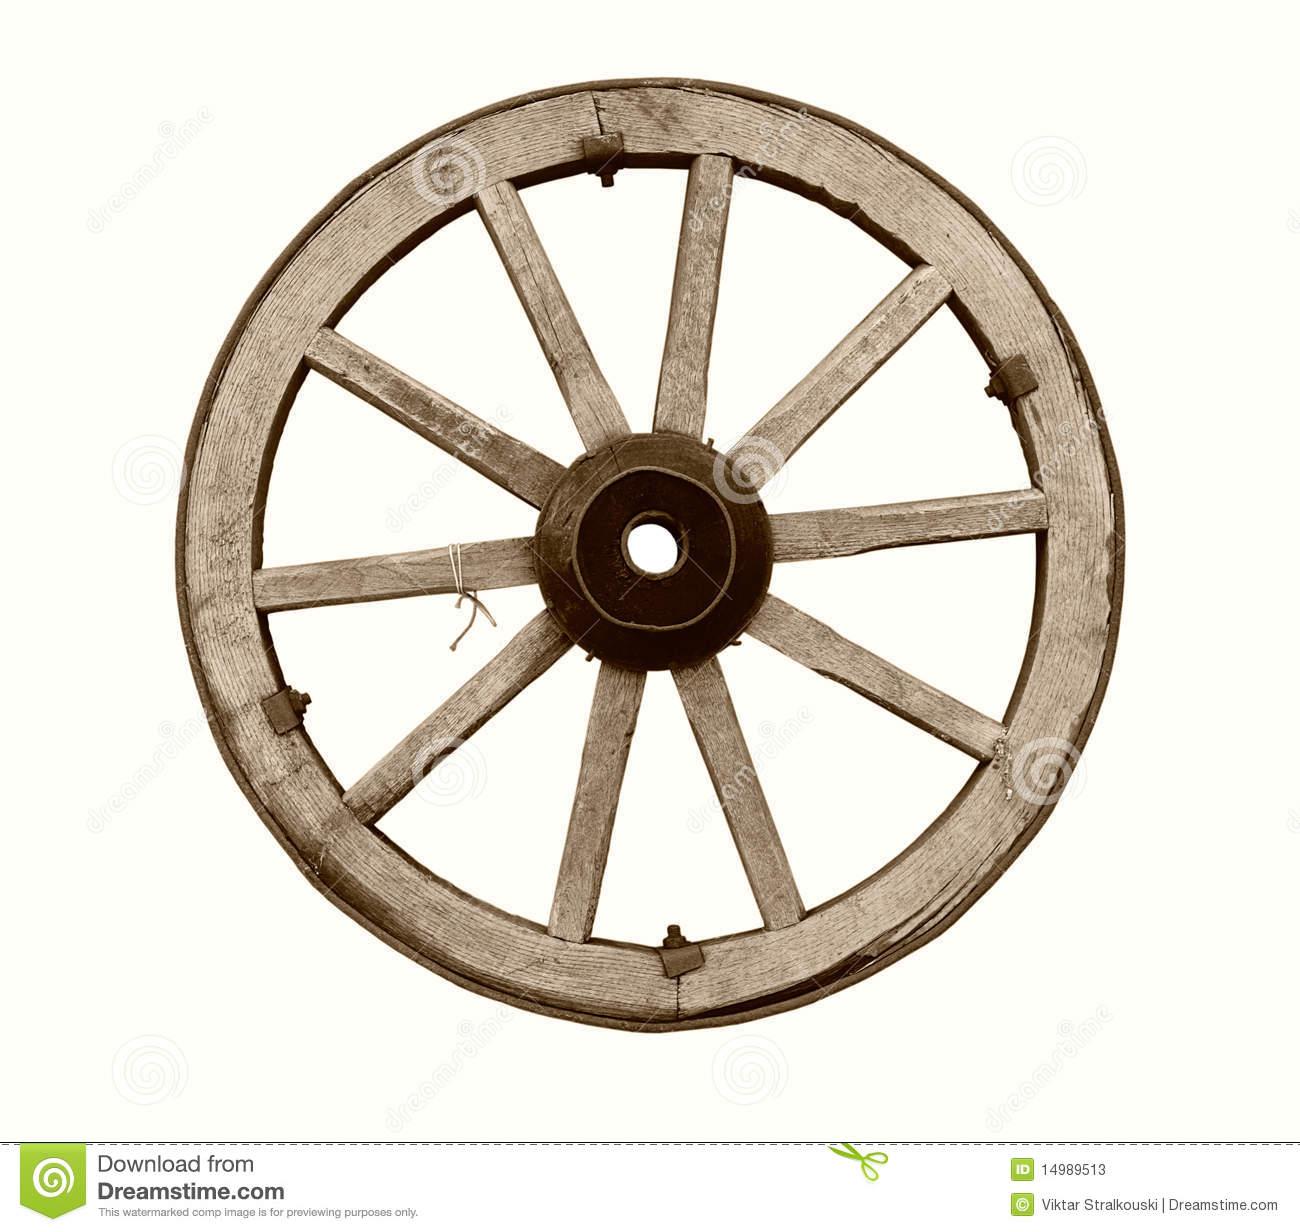 Vintage Wooden Wagon Wheel Isolated. Stock Photo.